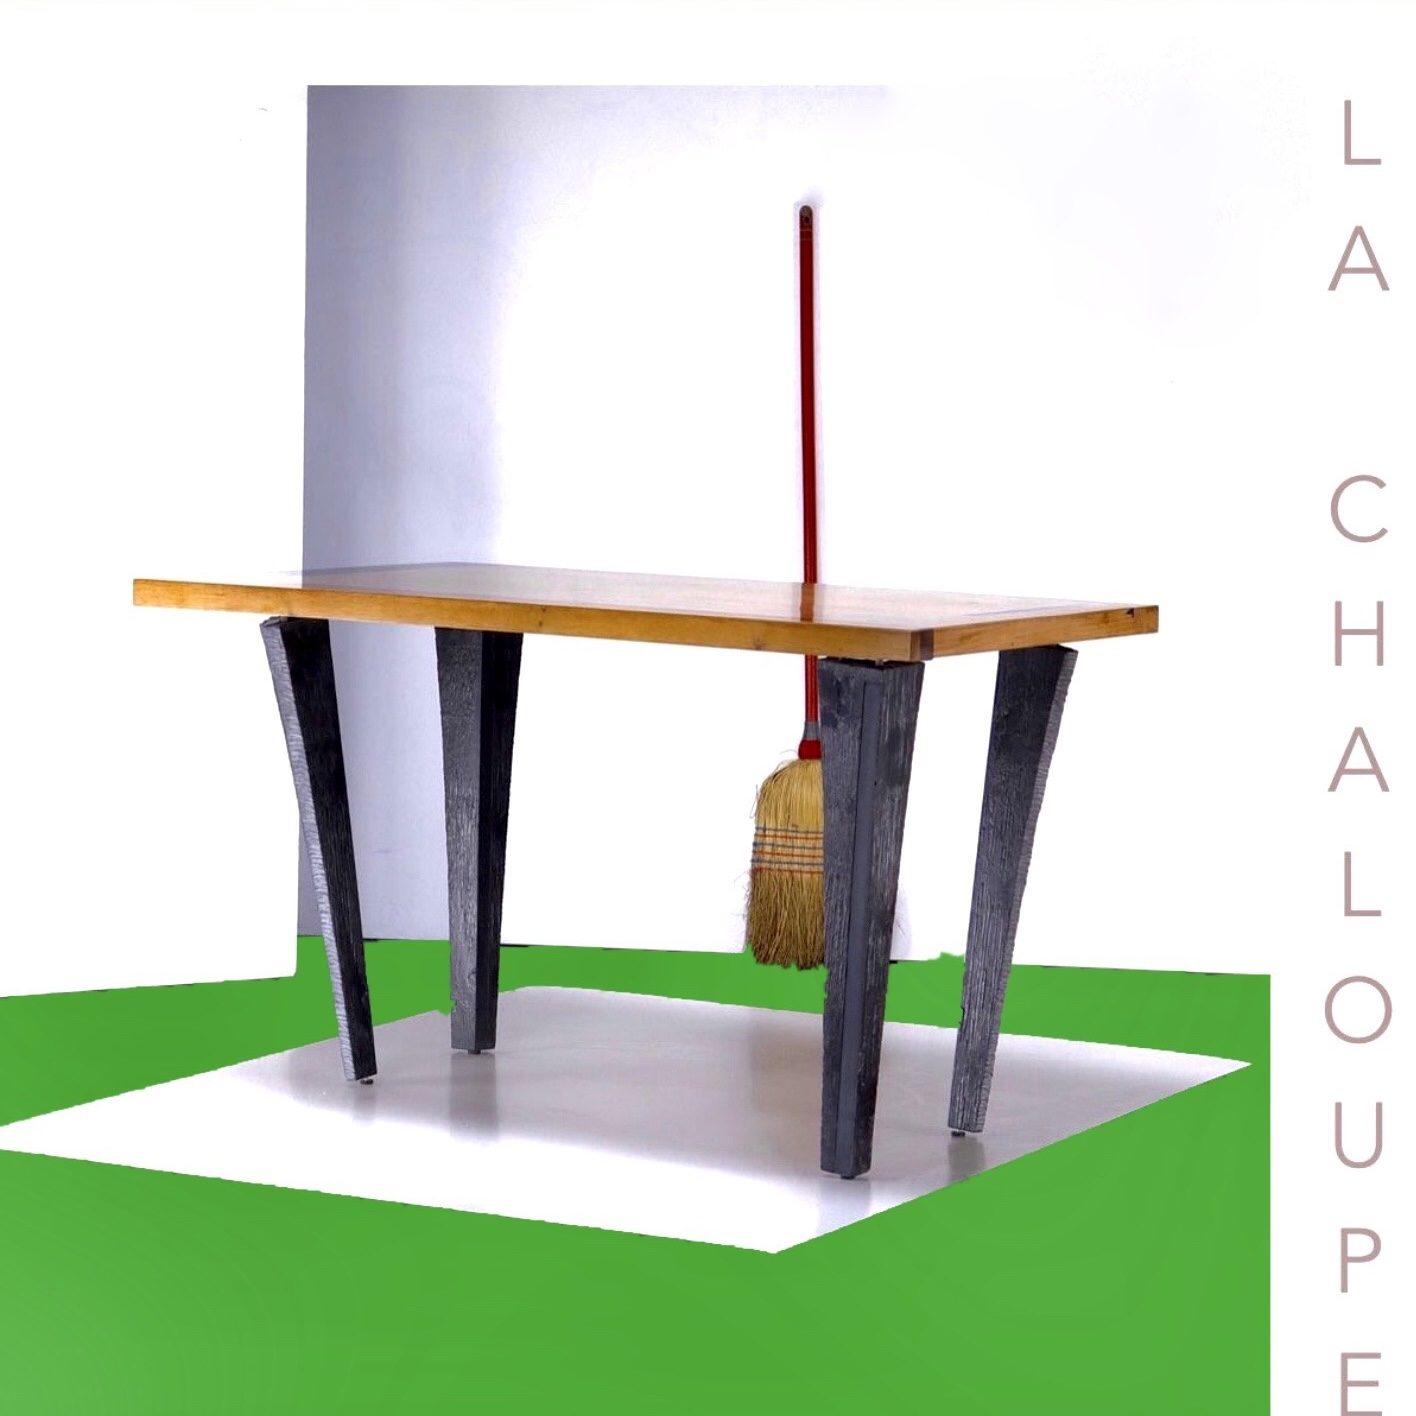 LA CHALOUPEE